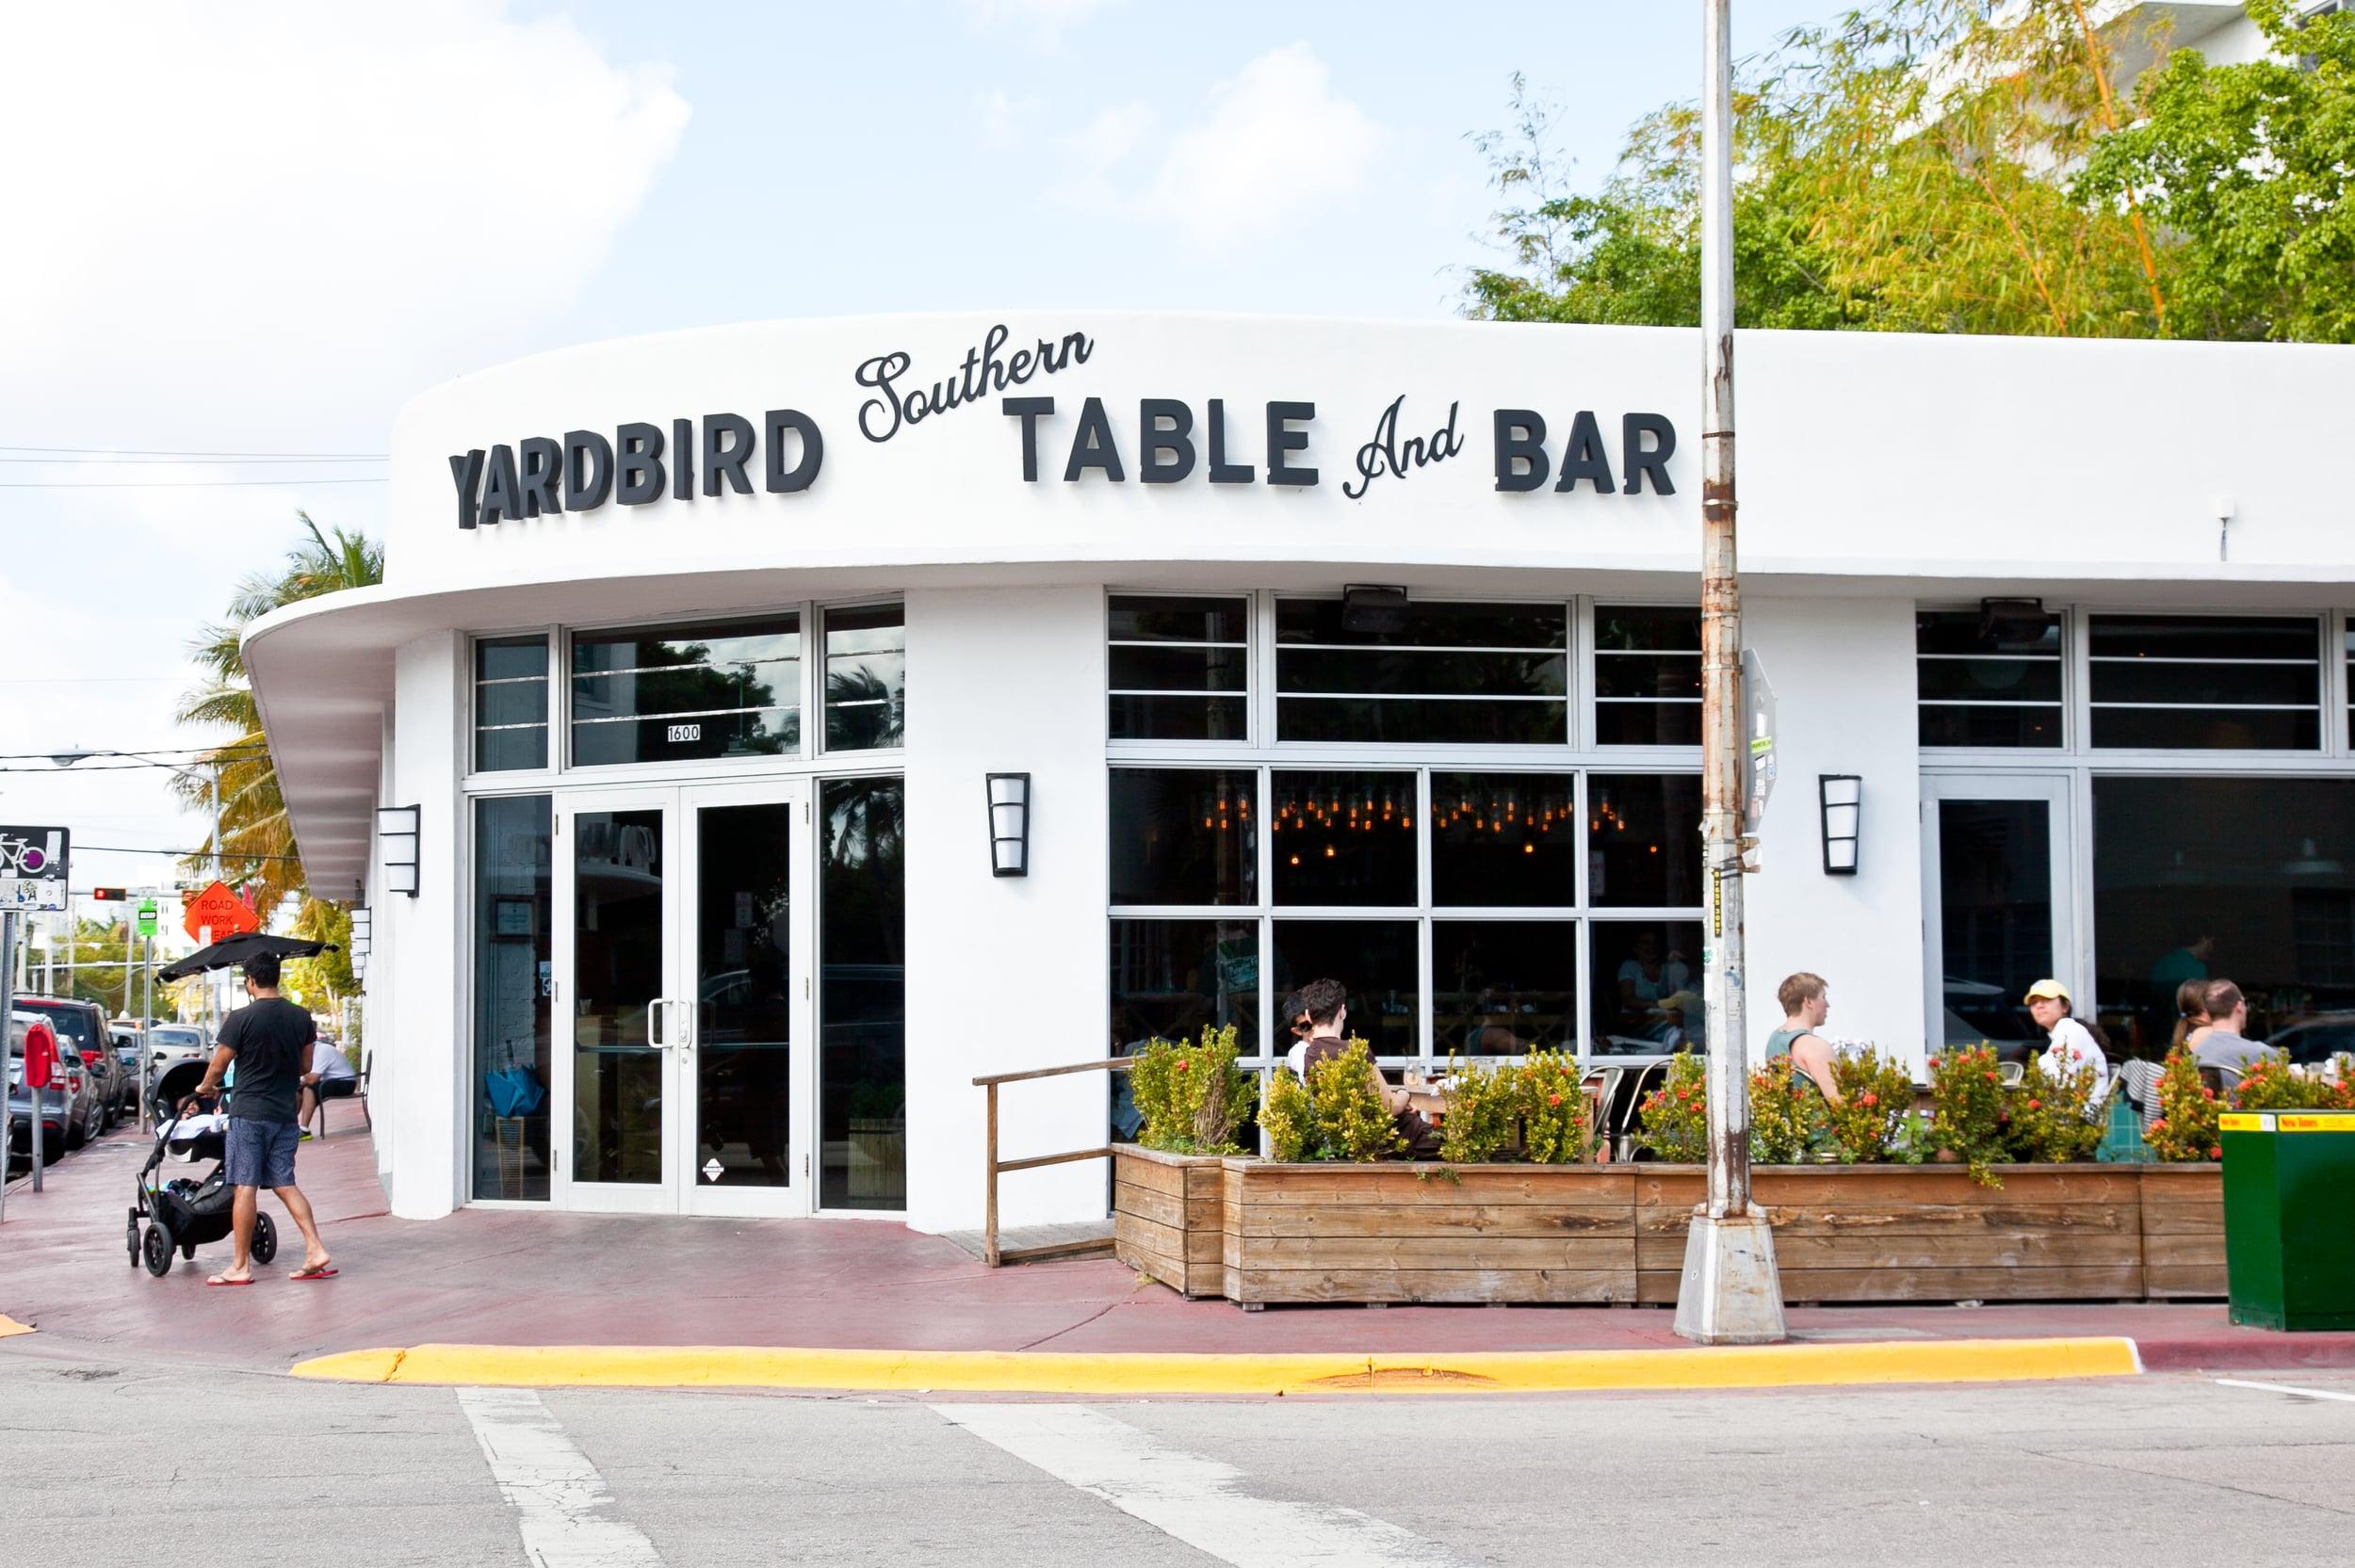 trisa-taro-miami-food-yardbird-southern-table-and-bar.jpg